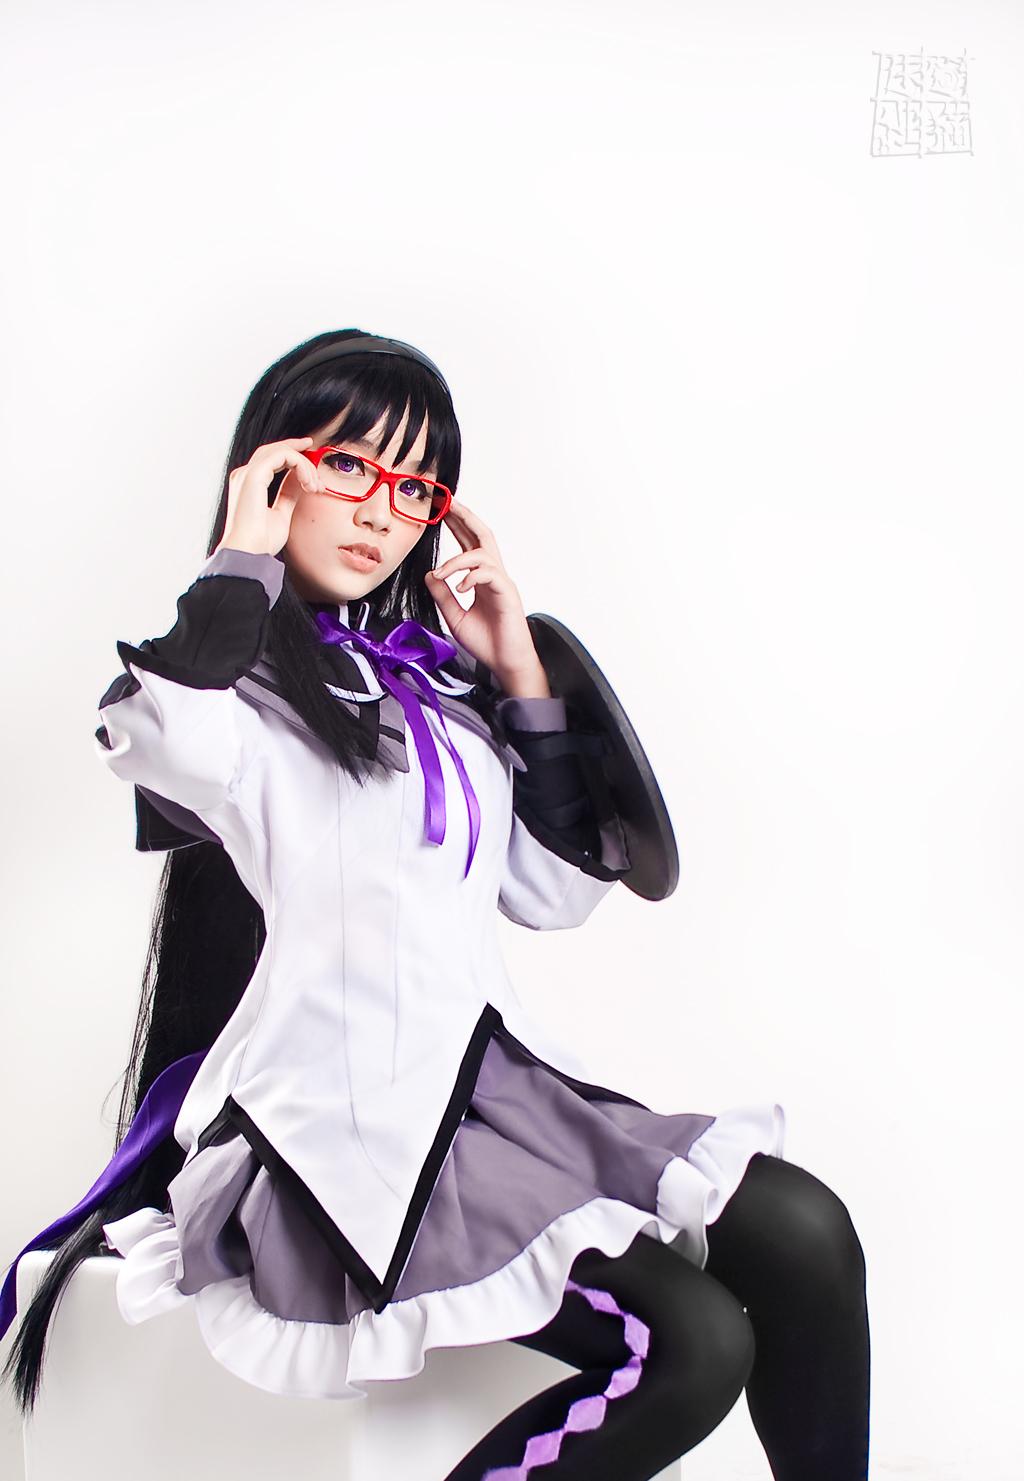 Homura Akemi Cosplay - Puella Magi Madoka Magica by rae-yei